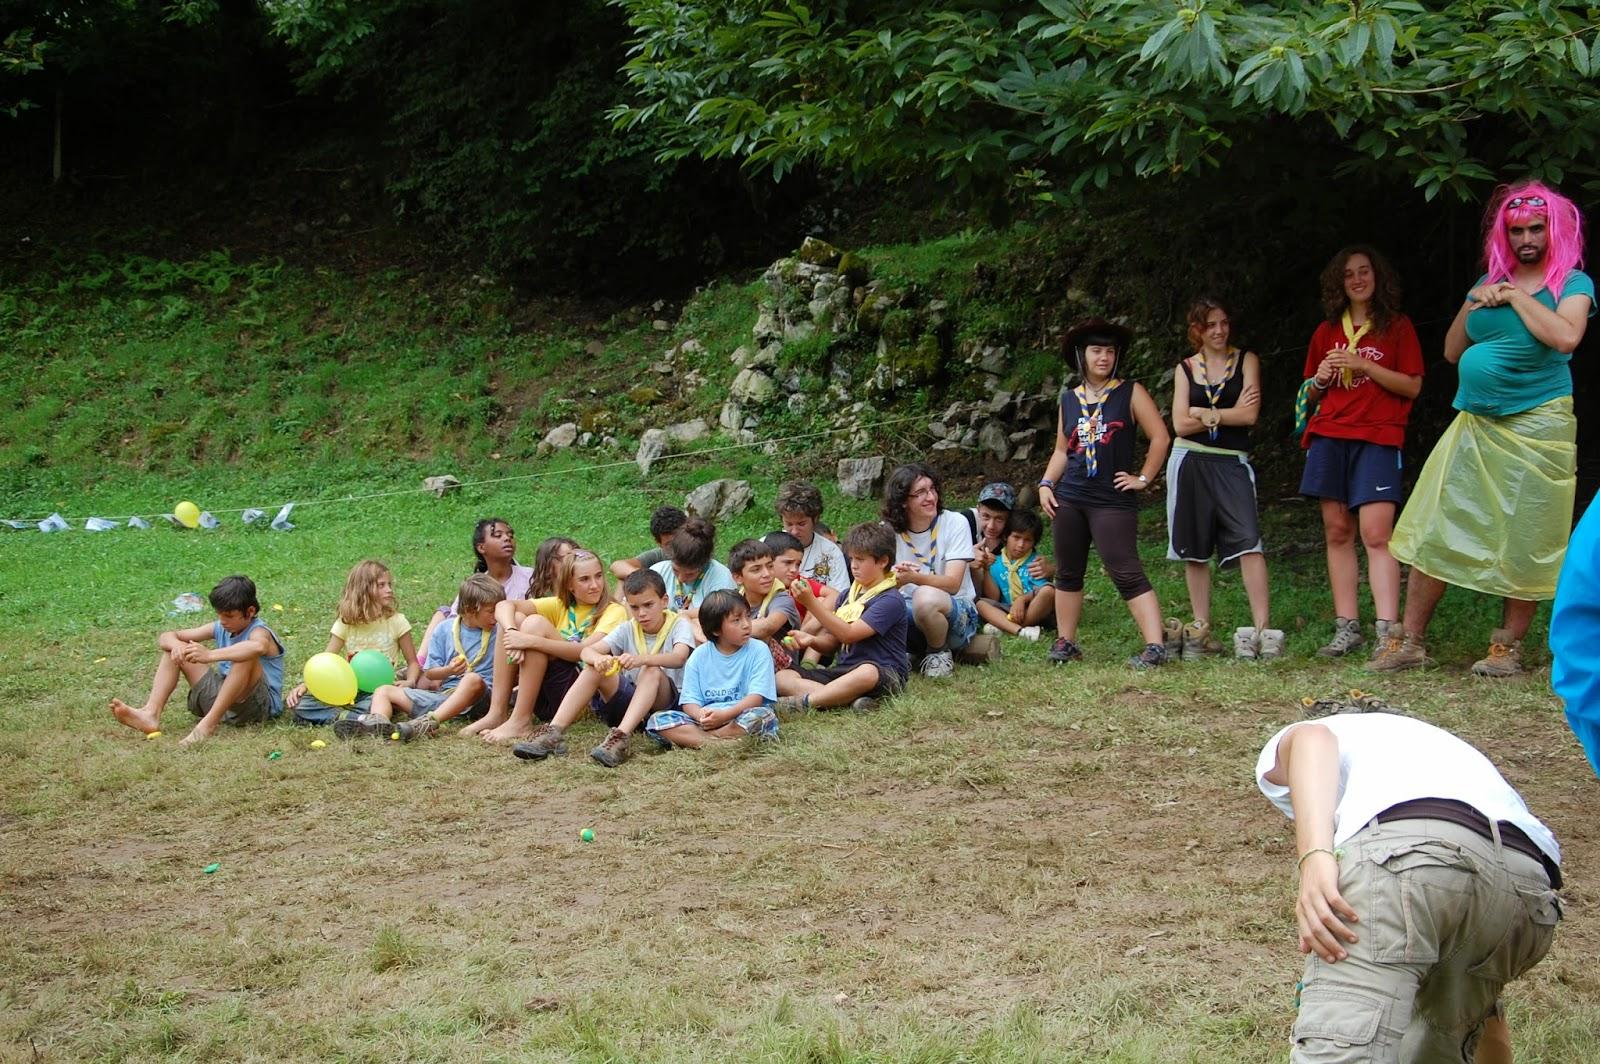 Campaments Estiu RolandKing 2011 - DSC_0283.JPG